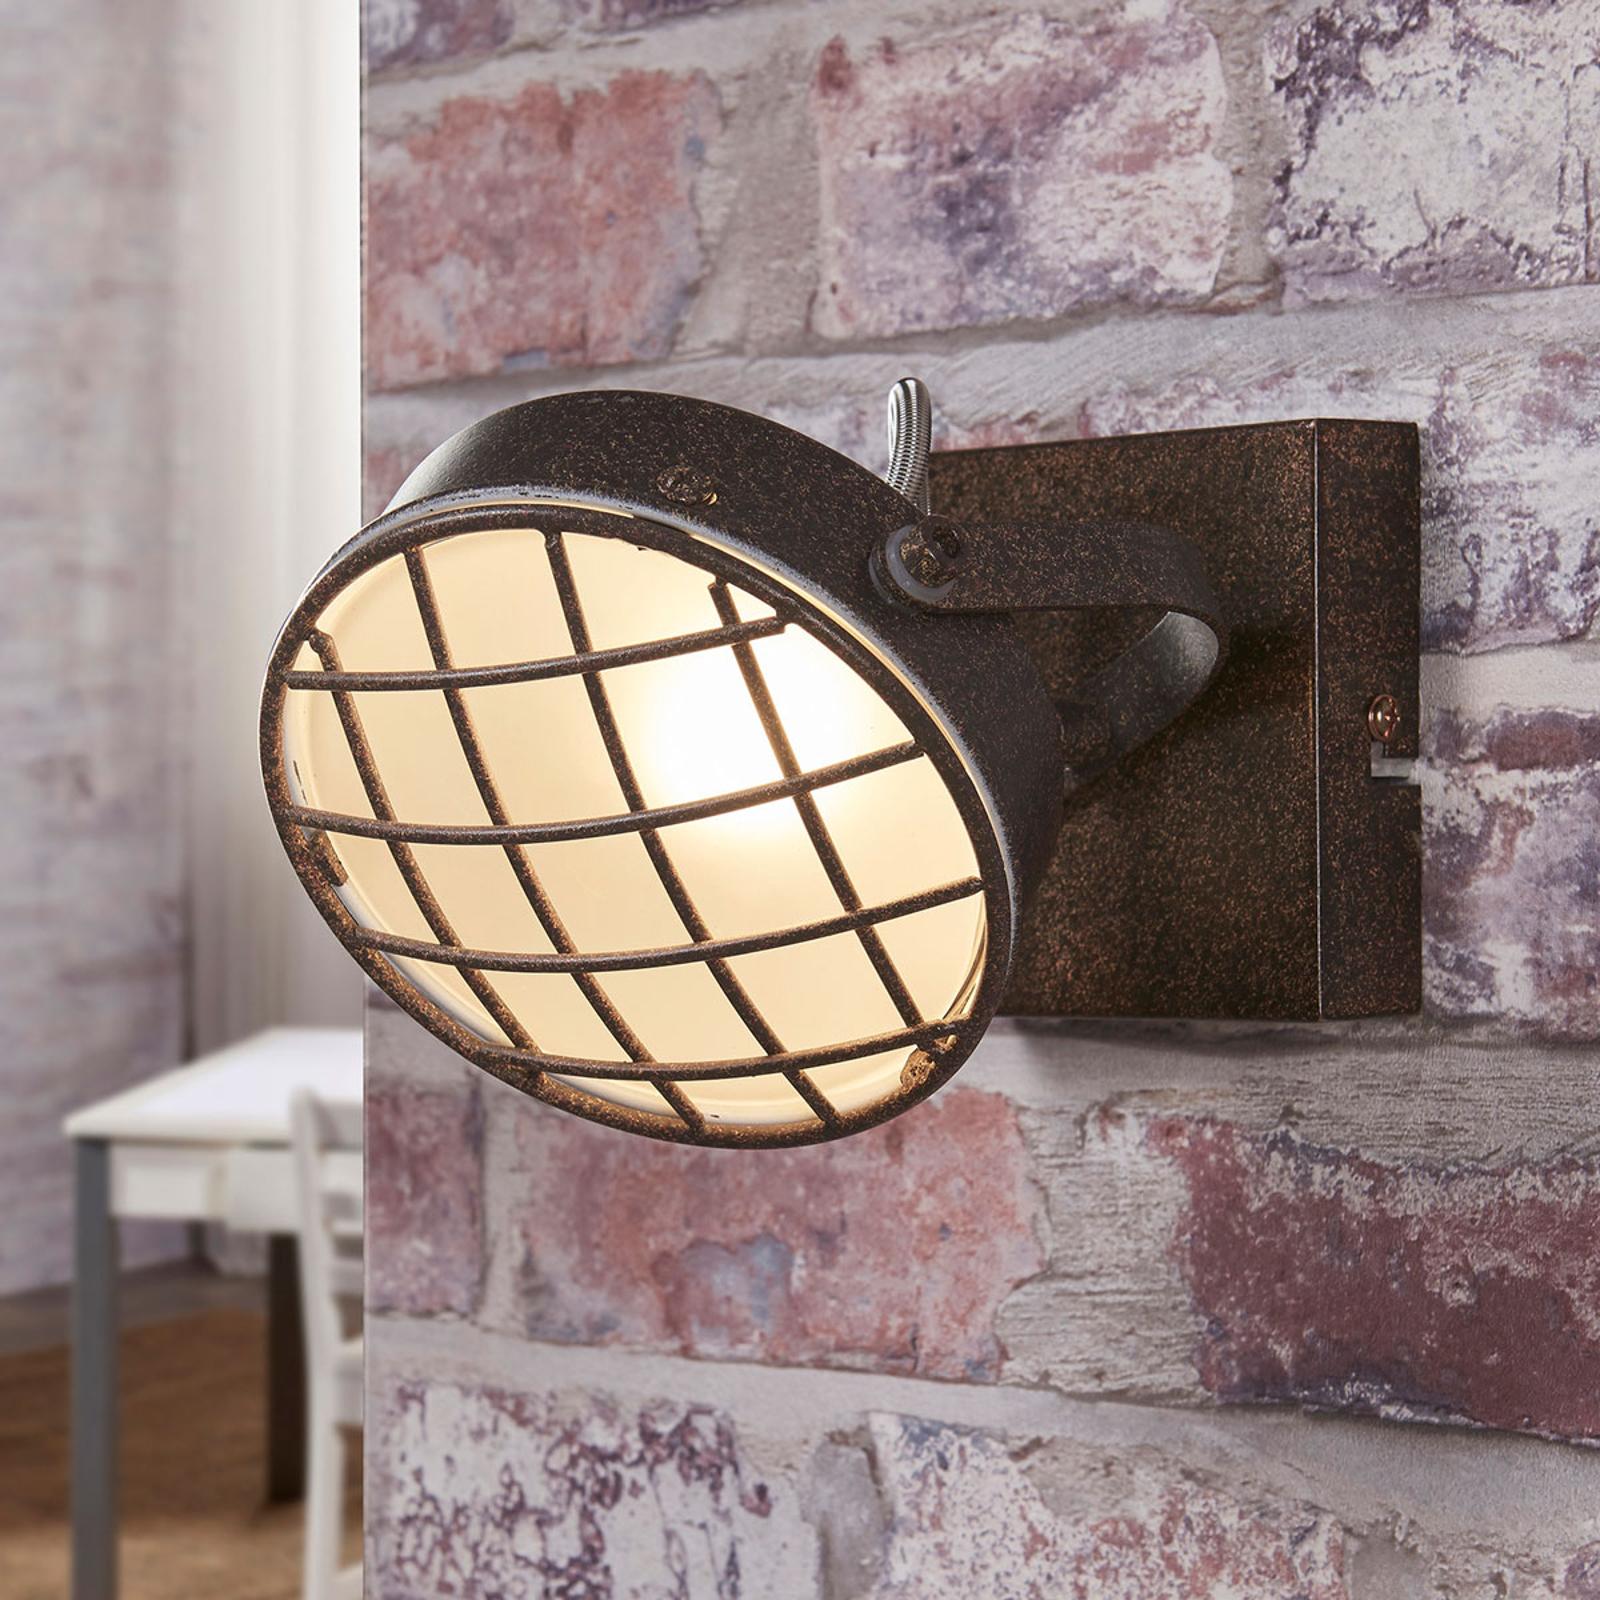 Roestkleurige LED wandlamp Tamin, industrieel